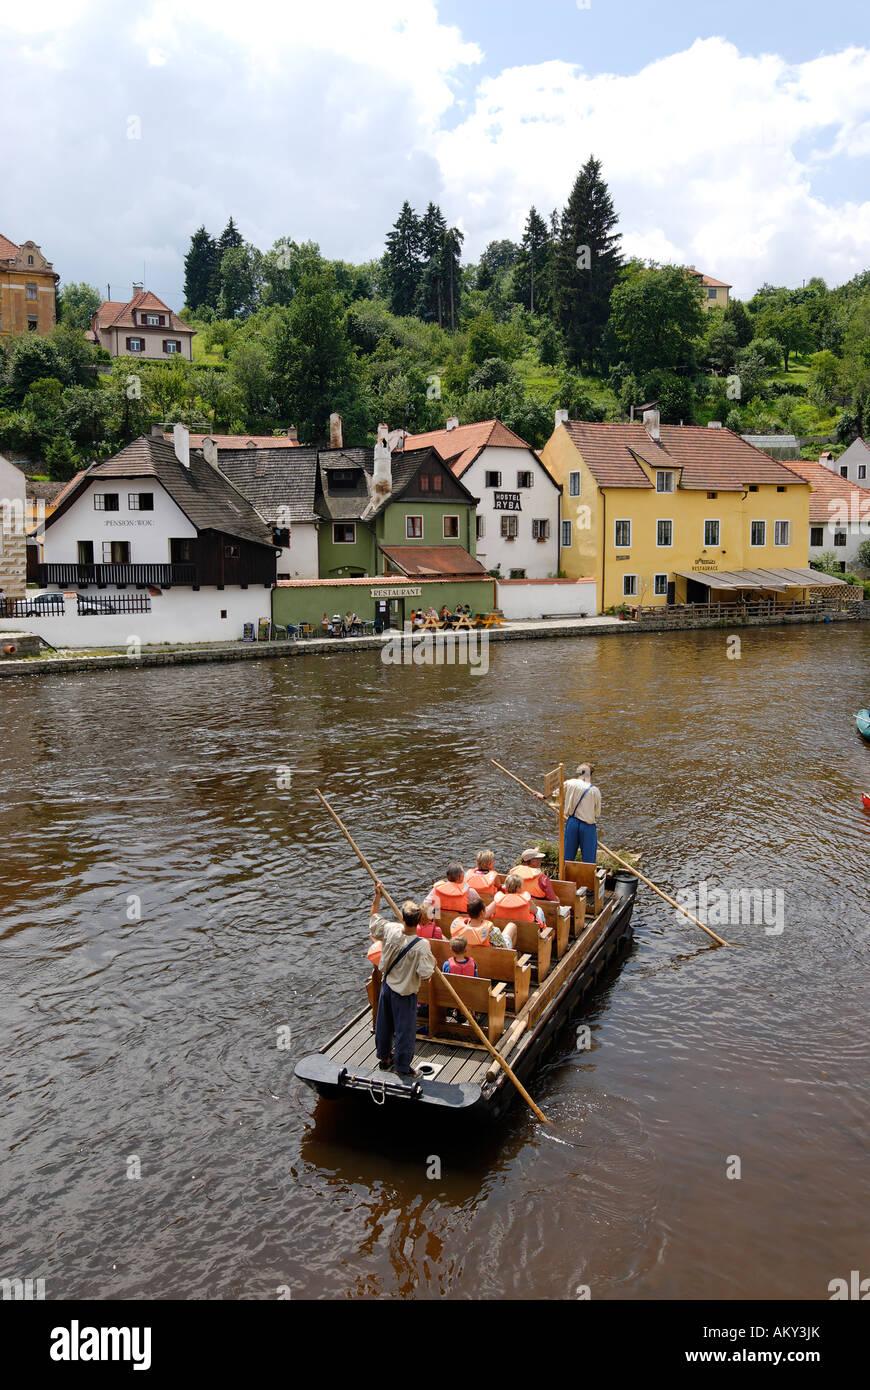 Cesky Krumlov Krumau at the Moldau Vltava Bohemian Forest Sumava Czech Republik in the Oldt town center canoes on - Stock Image